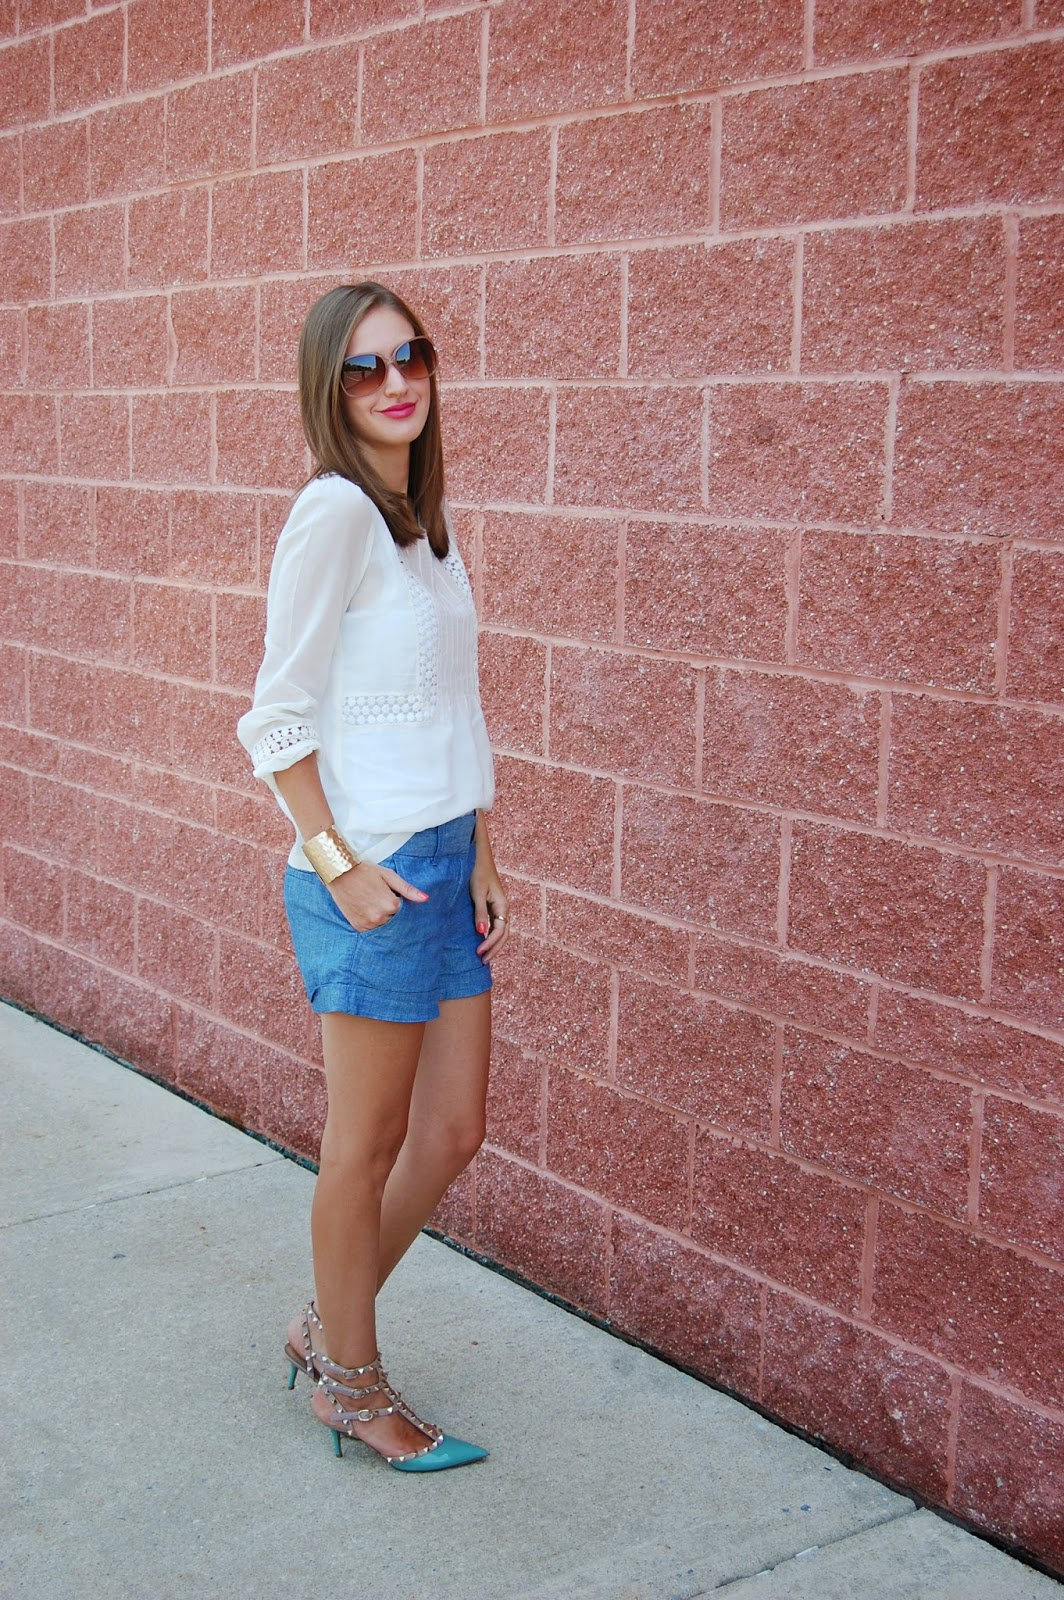 Wearing Loft Peasant Blouse, Chambray shorts, Prima Donna Gold Hathor Hammered Cuff , Wearing Blue Valentino Rockstuds, Summer 2014 looks